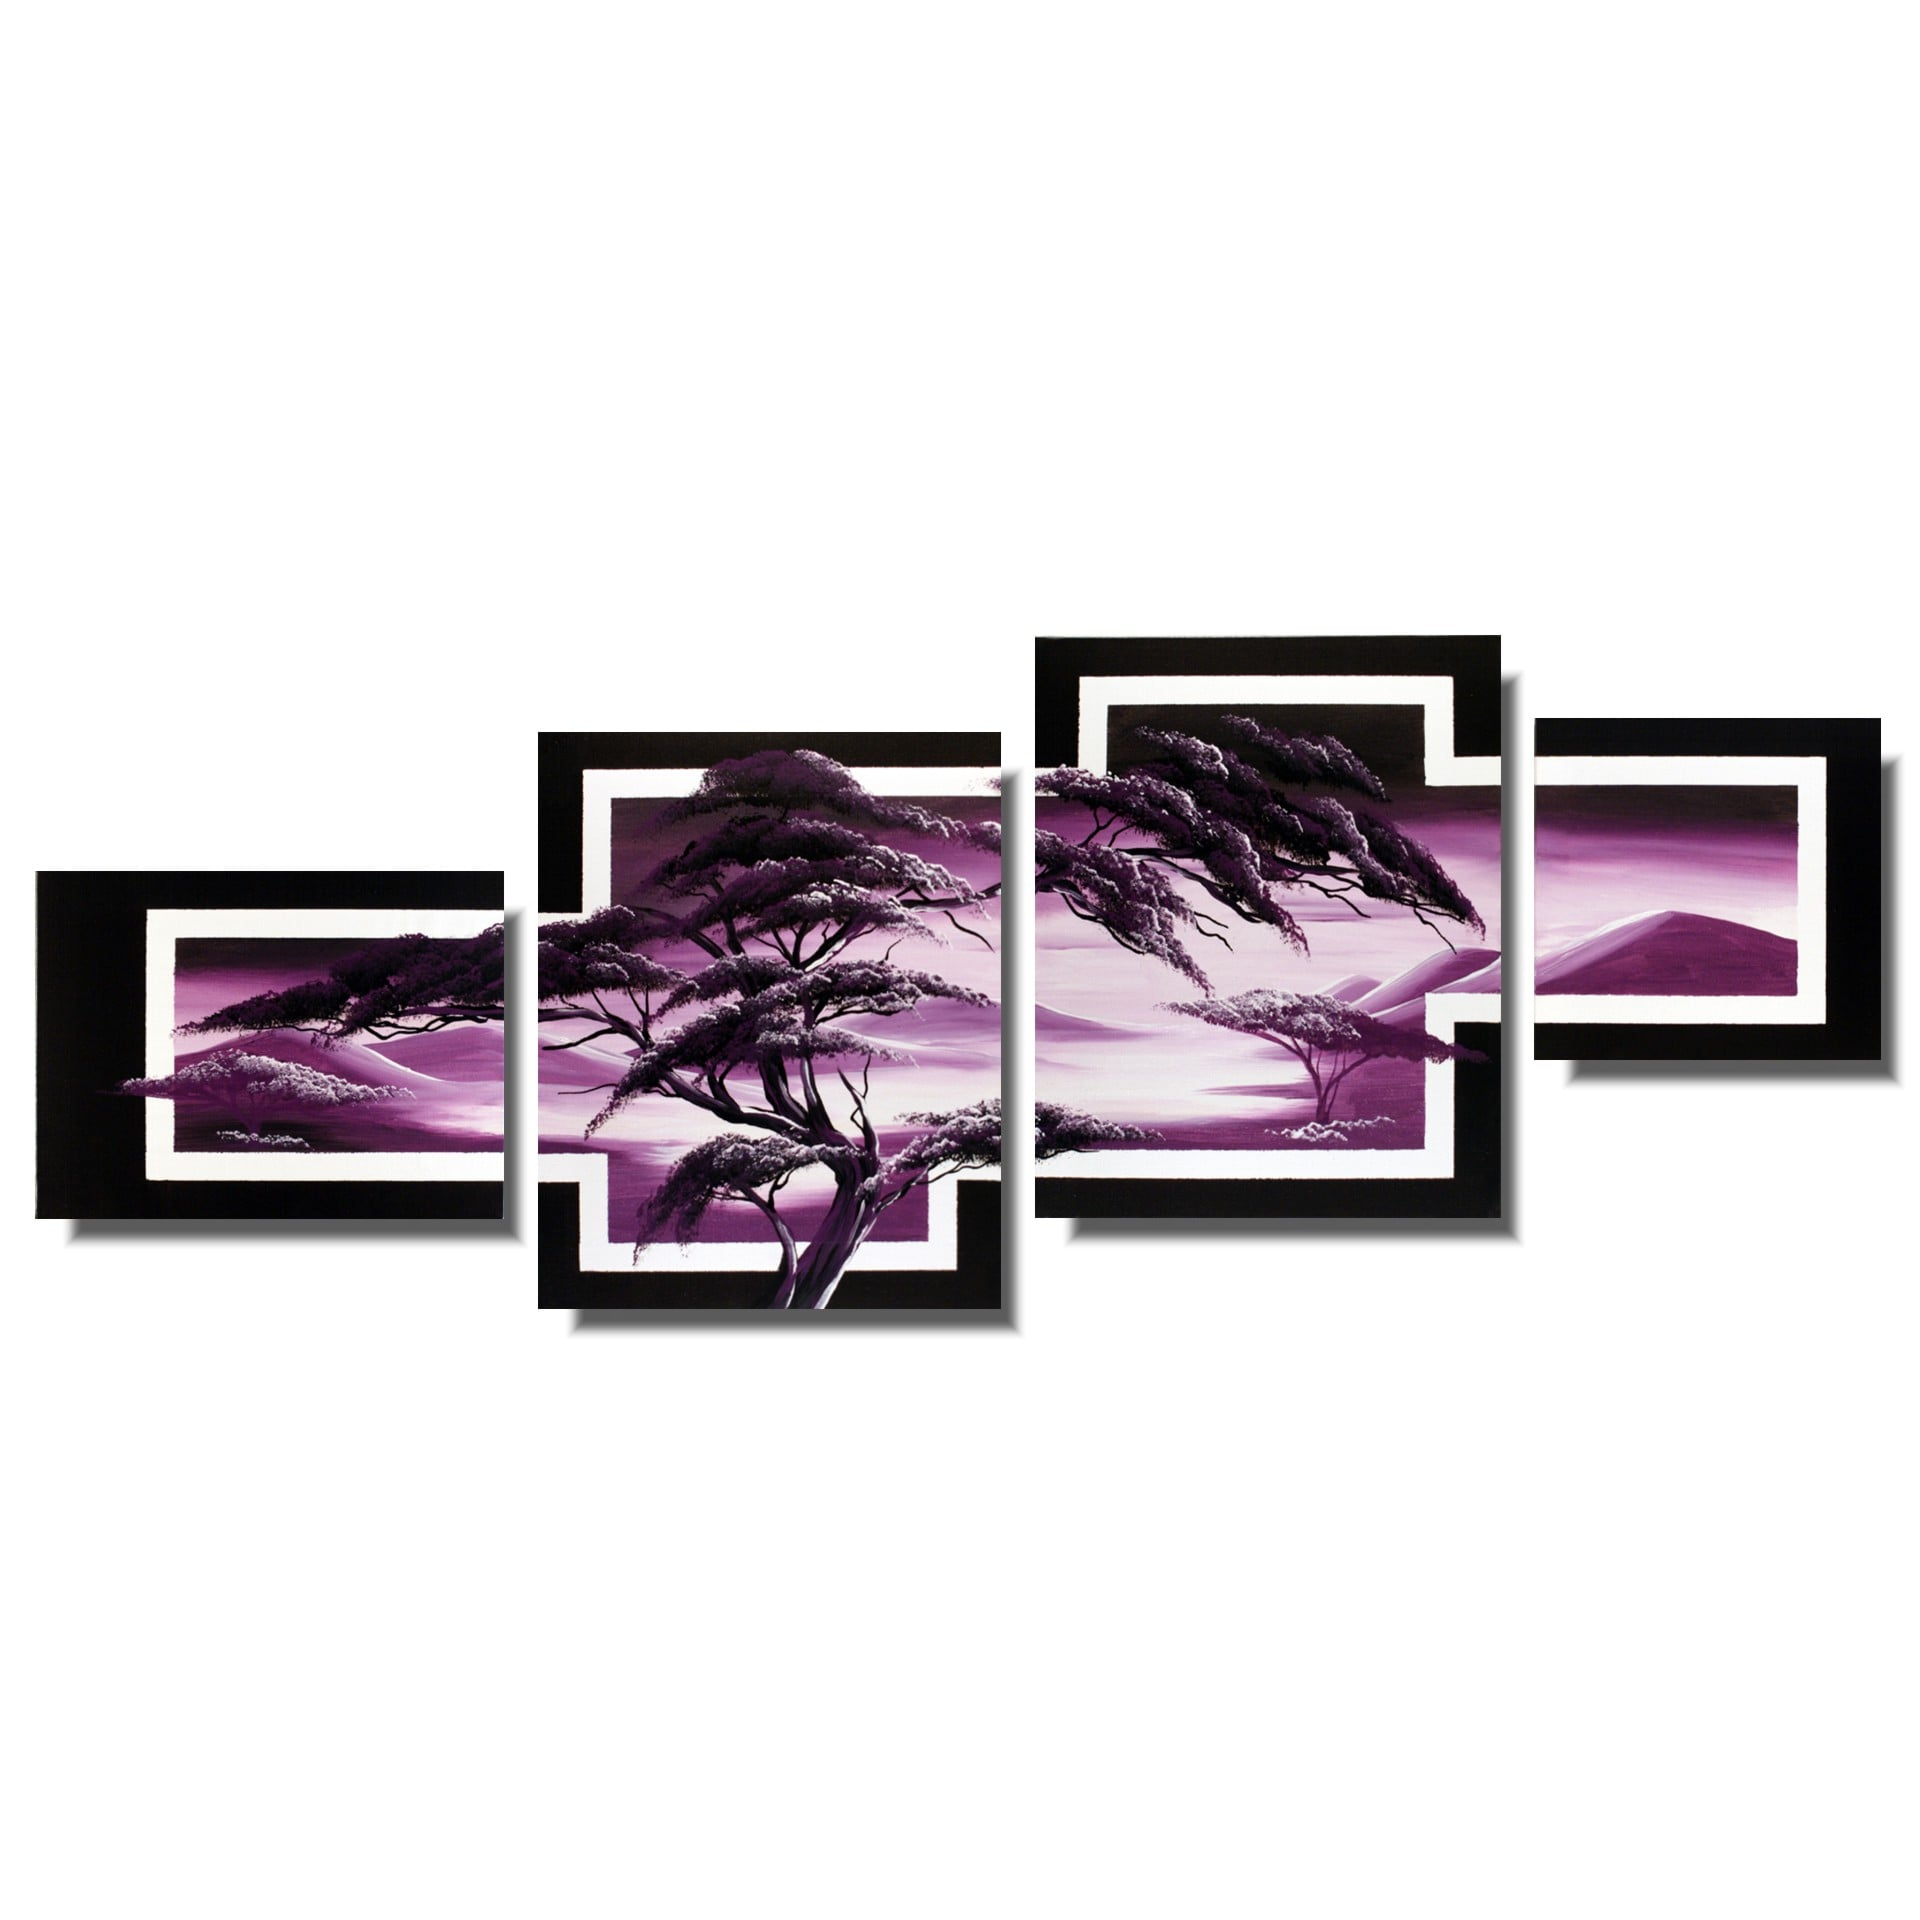 Obraz pejzaż fioletowa Afryka 384A